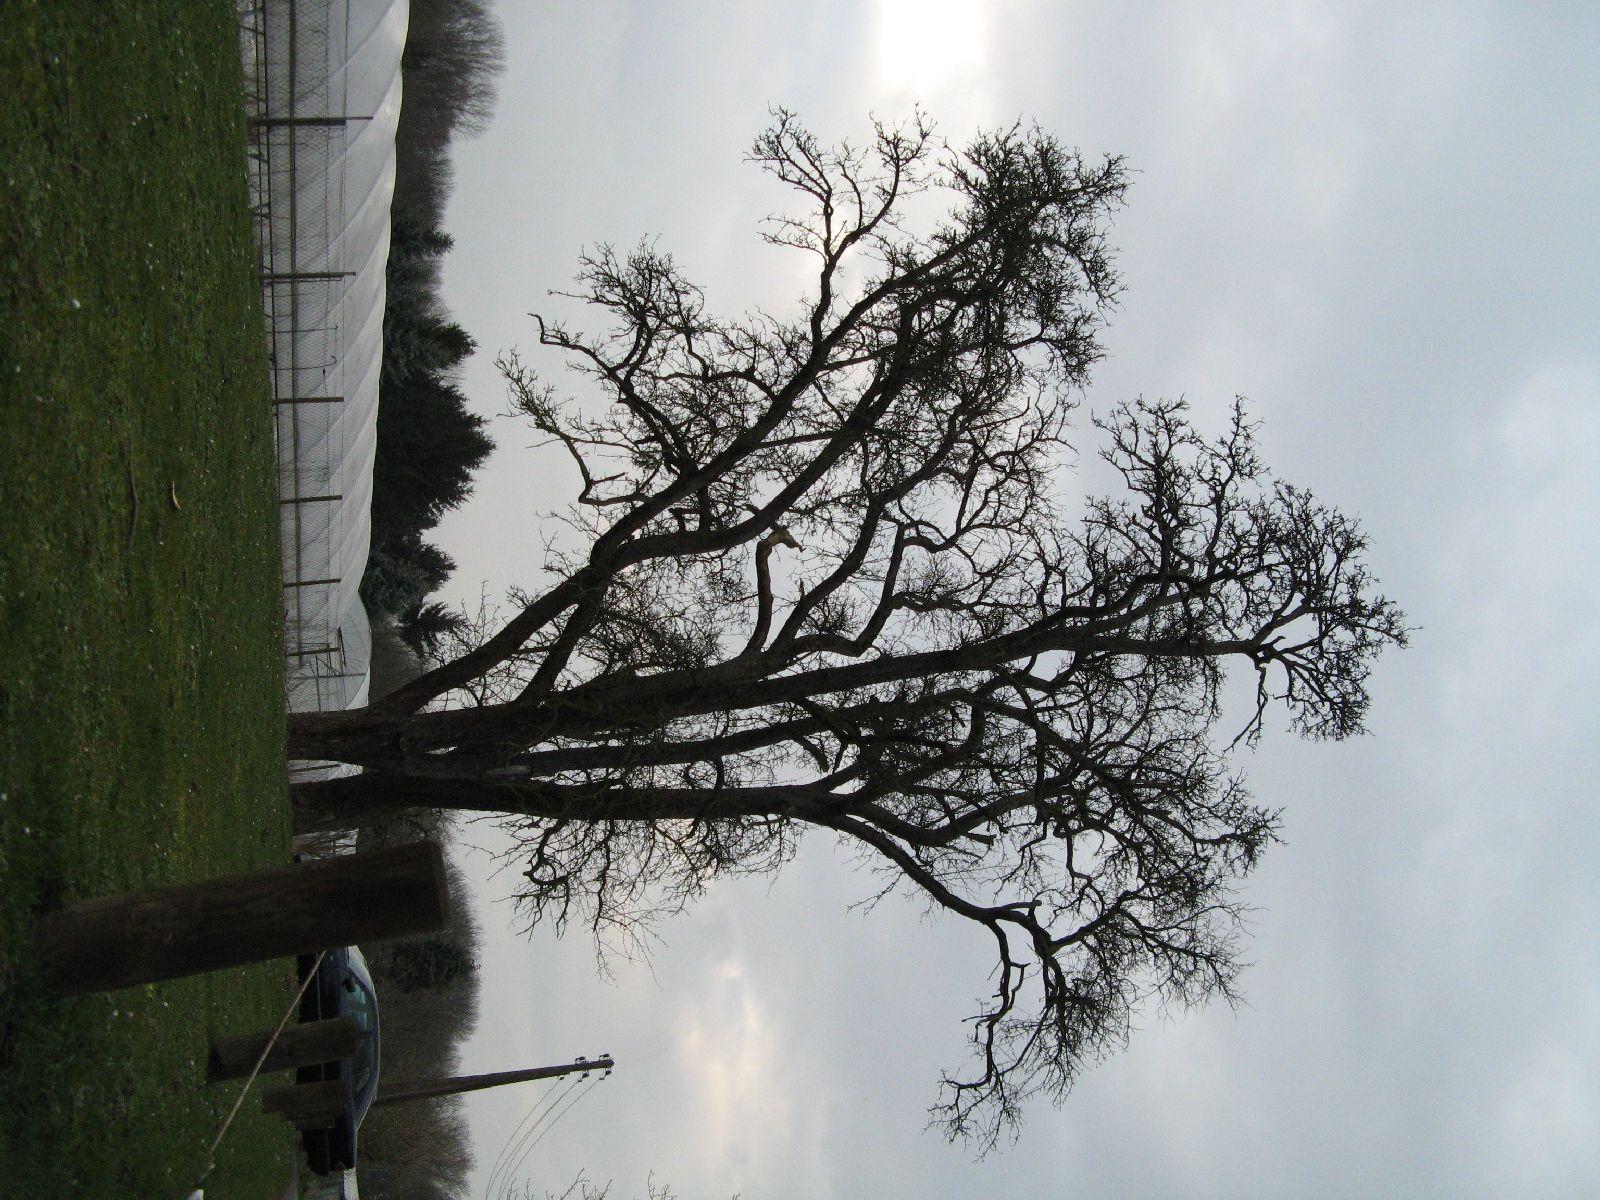 Plants-Trees_Photo_Texture_B_43380